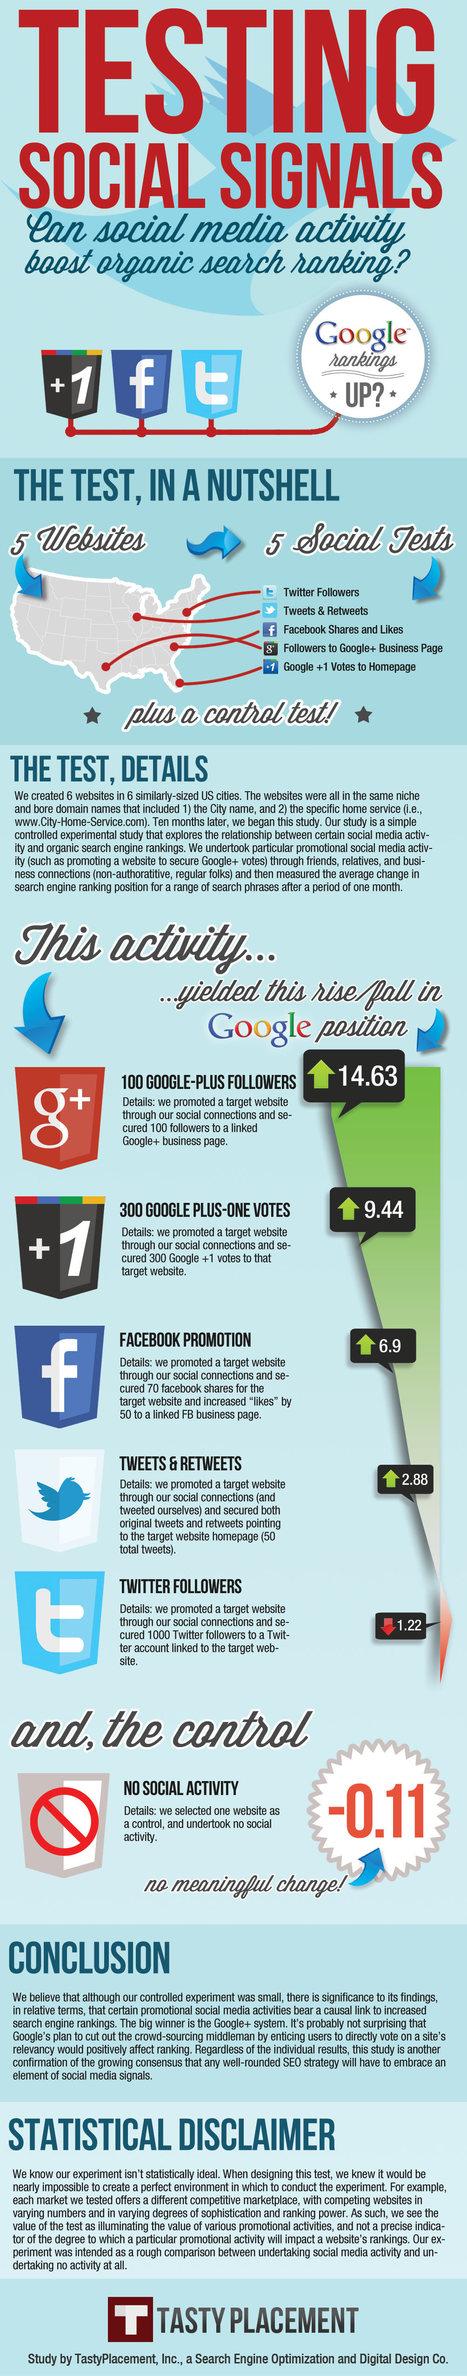 Get The Most Bang for Your Social Media Bucks [Infographic] | ten Hagen on Social Media | Scoop.it